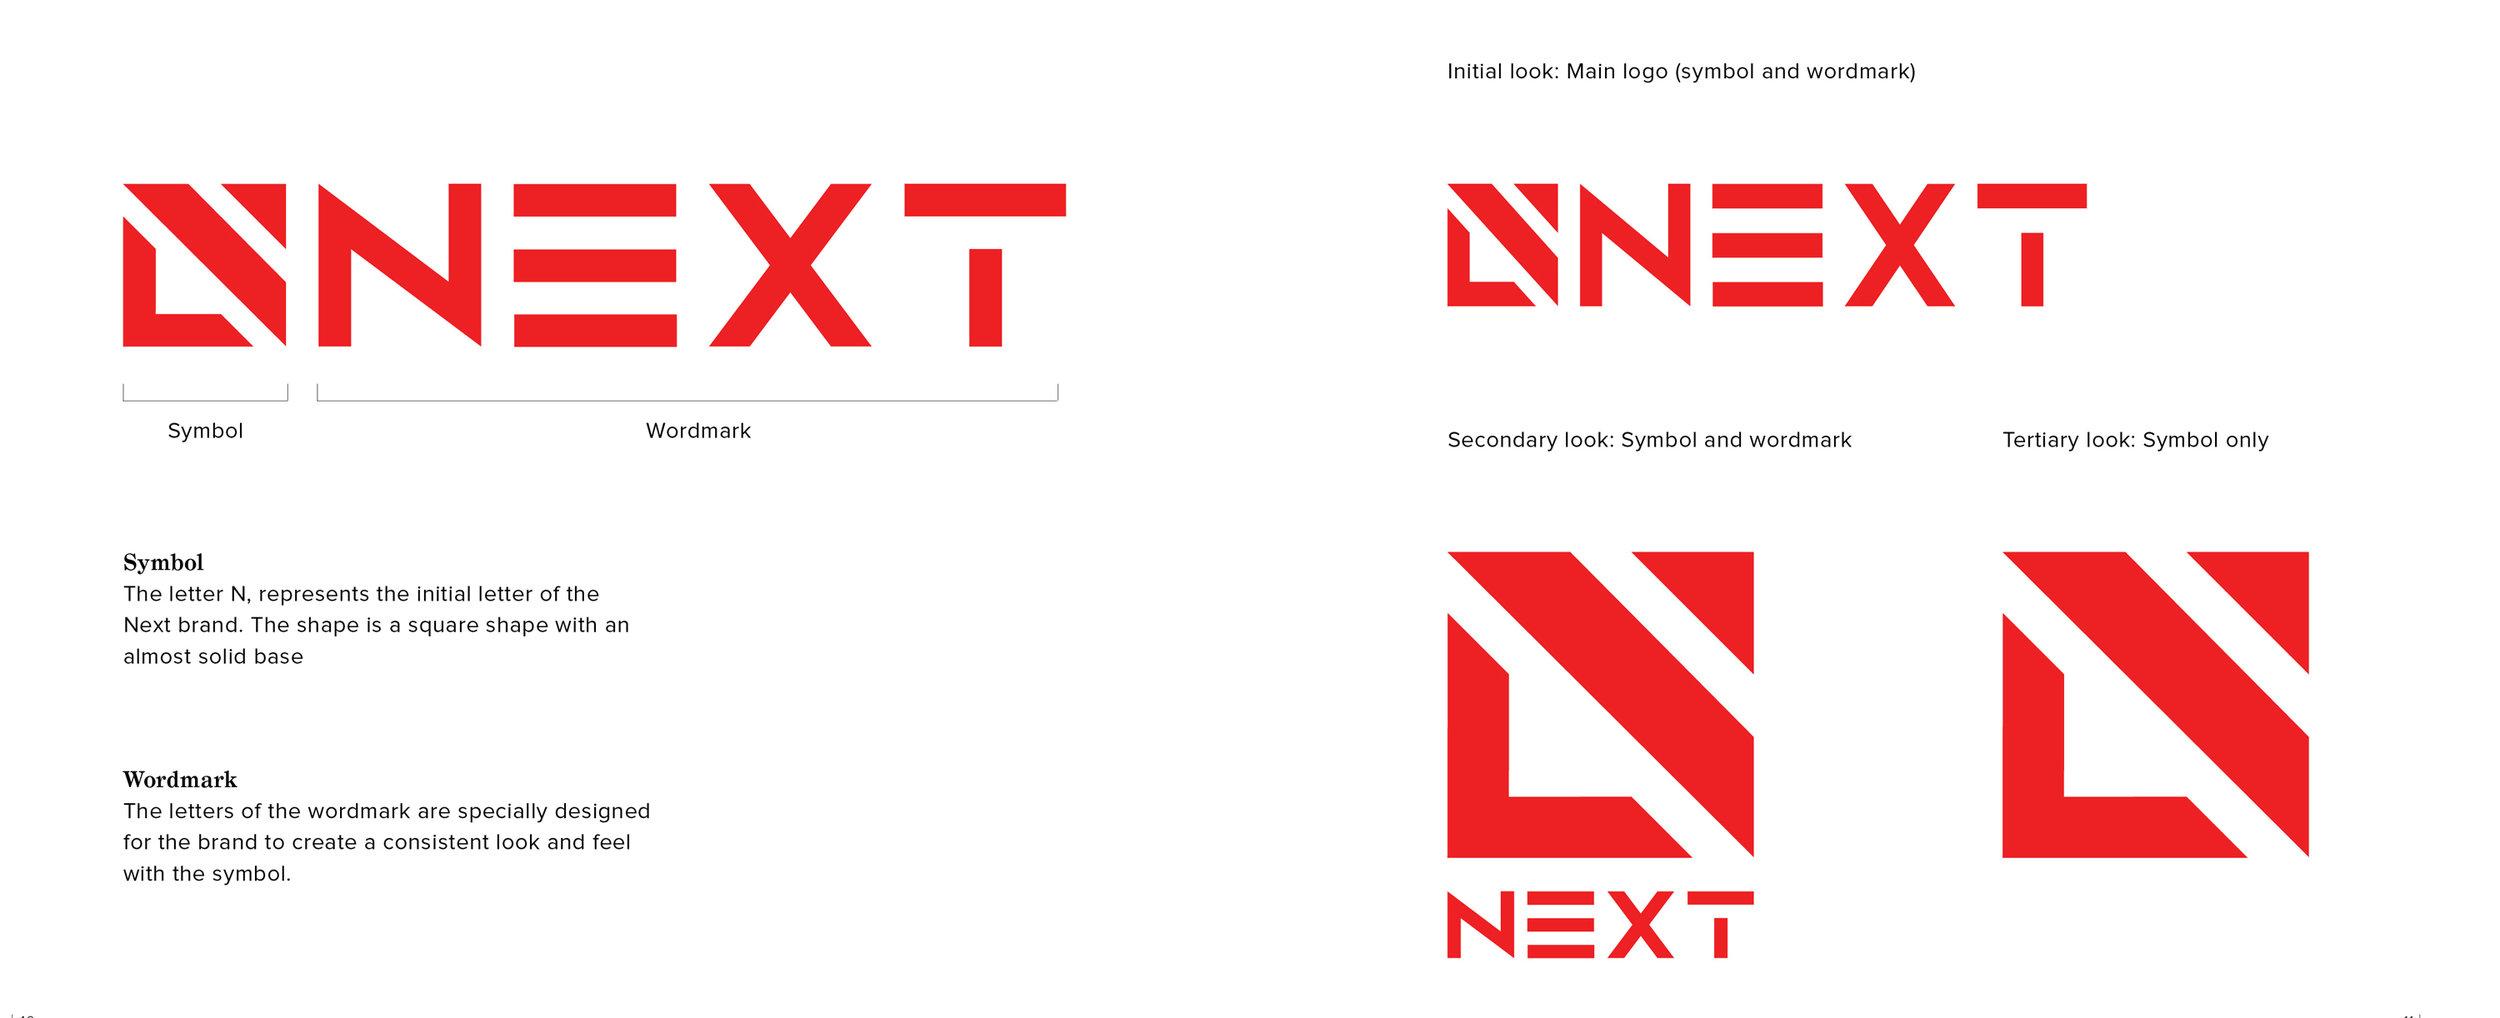 Next_3_-Visual-Standards-Guide6.jpg